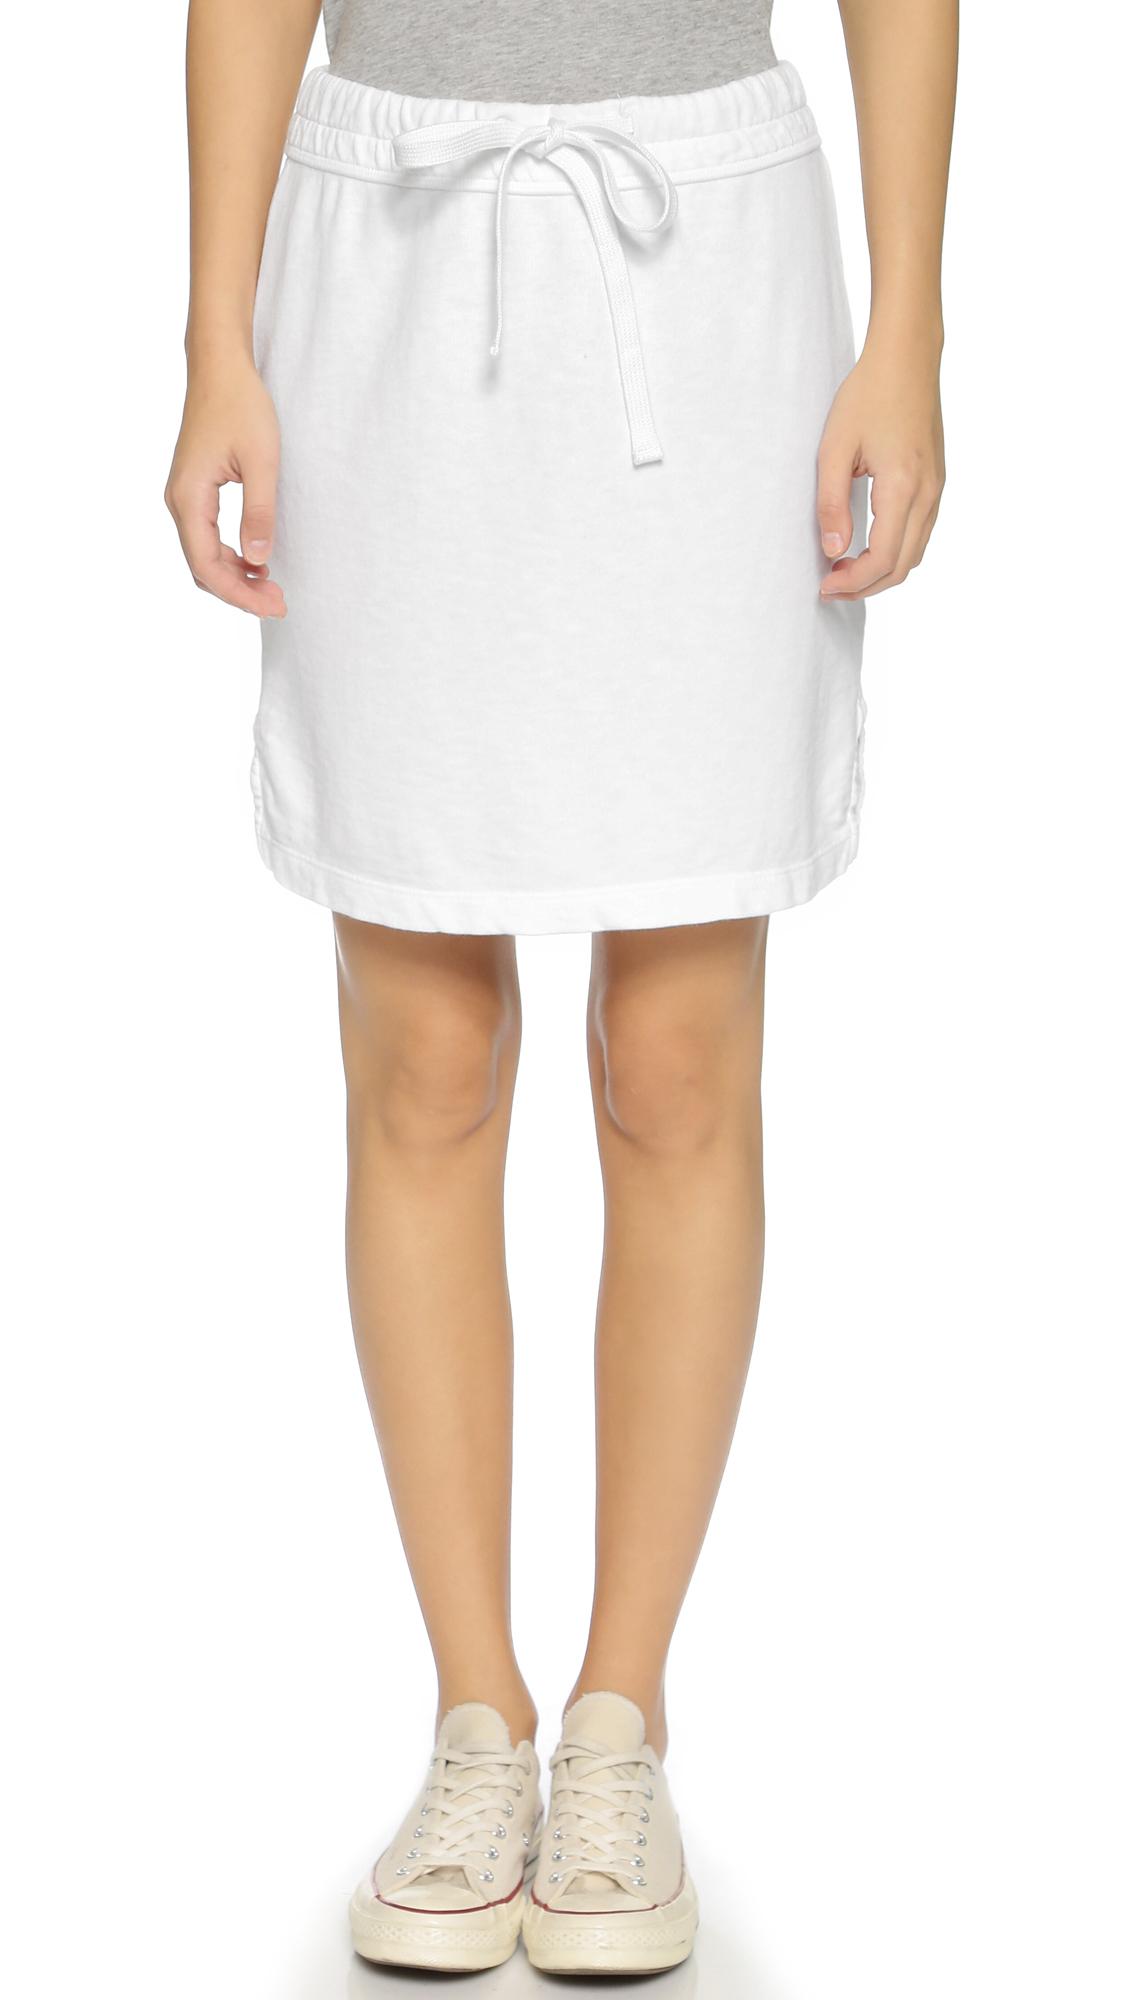 Lyst James Perse Drawstring Vintage Cotton Skirt White